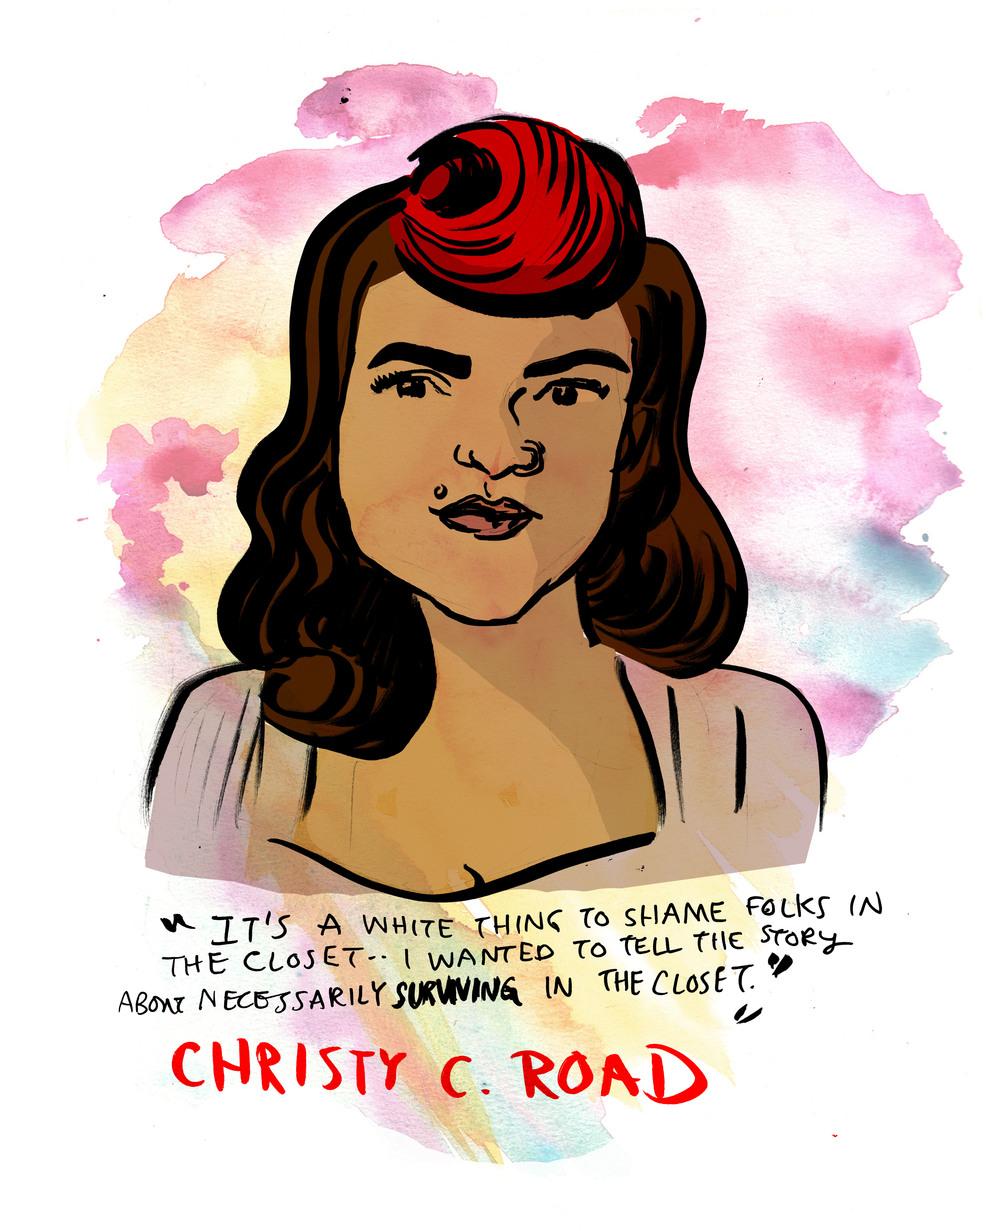 Christy C. Road